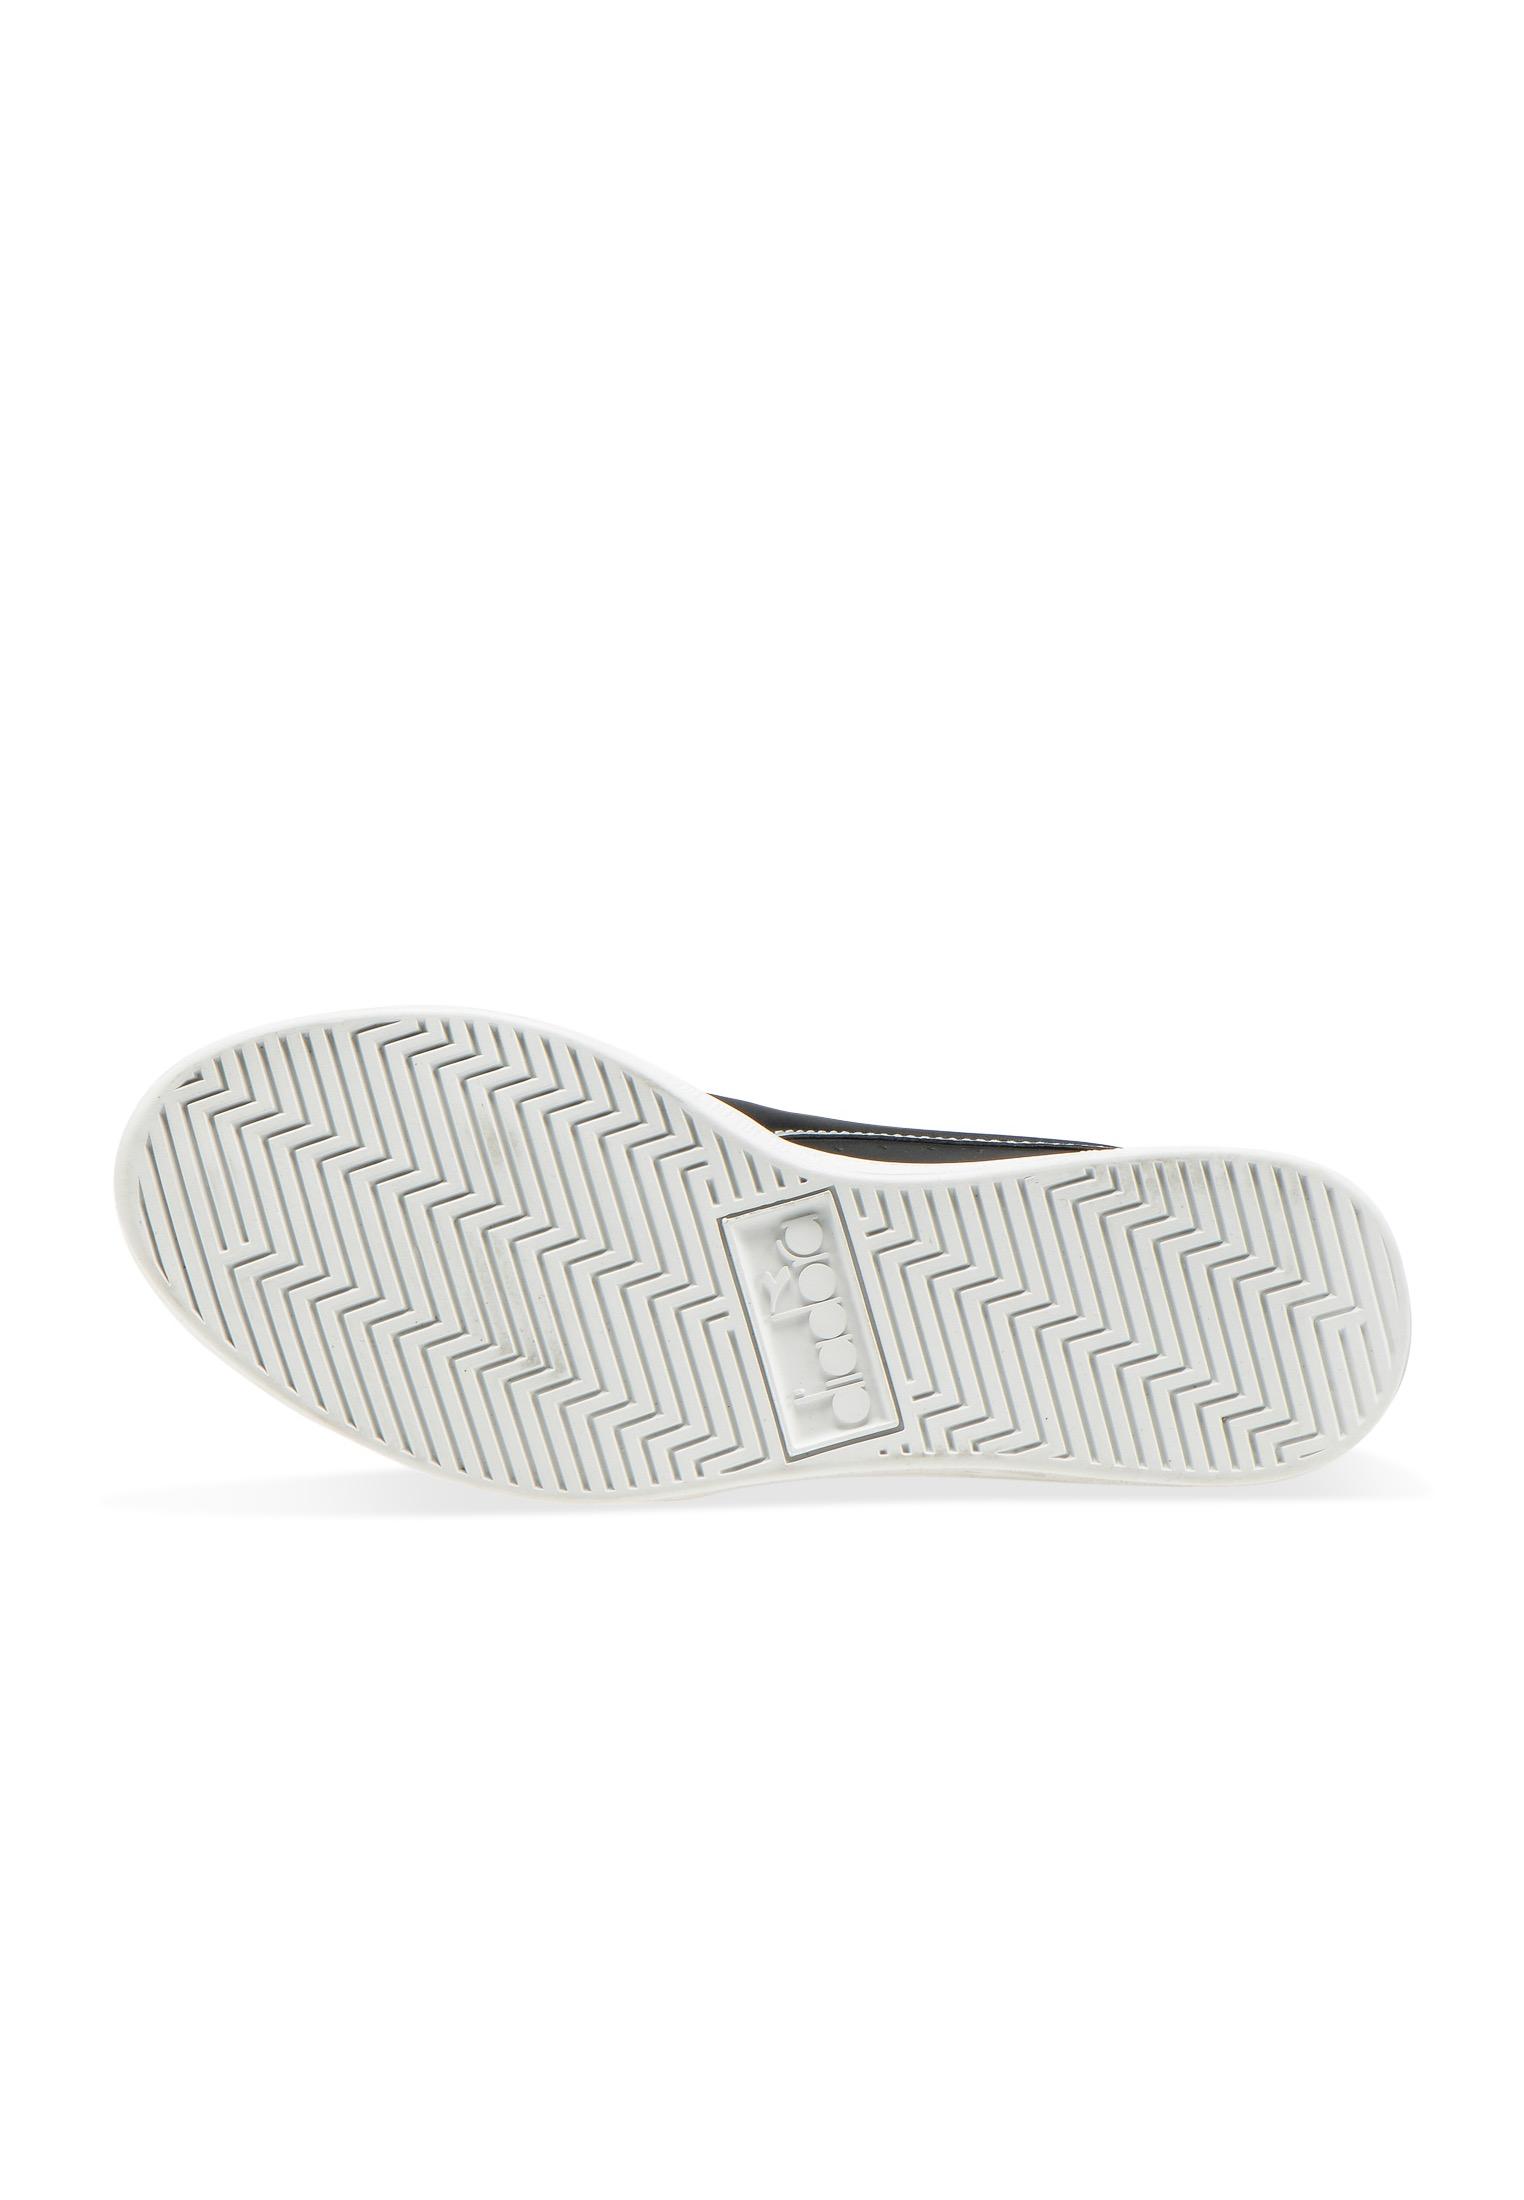 Diadora-Sneakers-GAME-P-WN-para-hombre-y-mujer miniatura 16